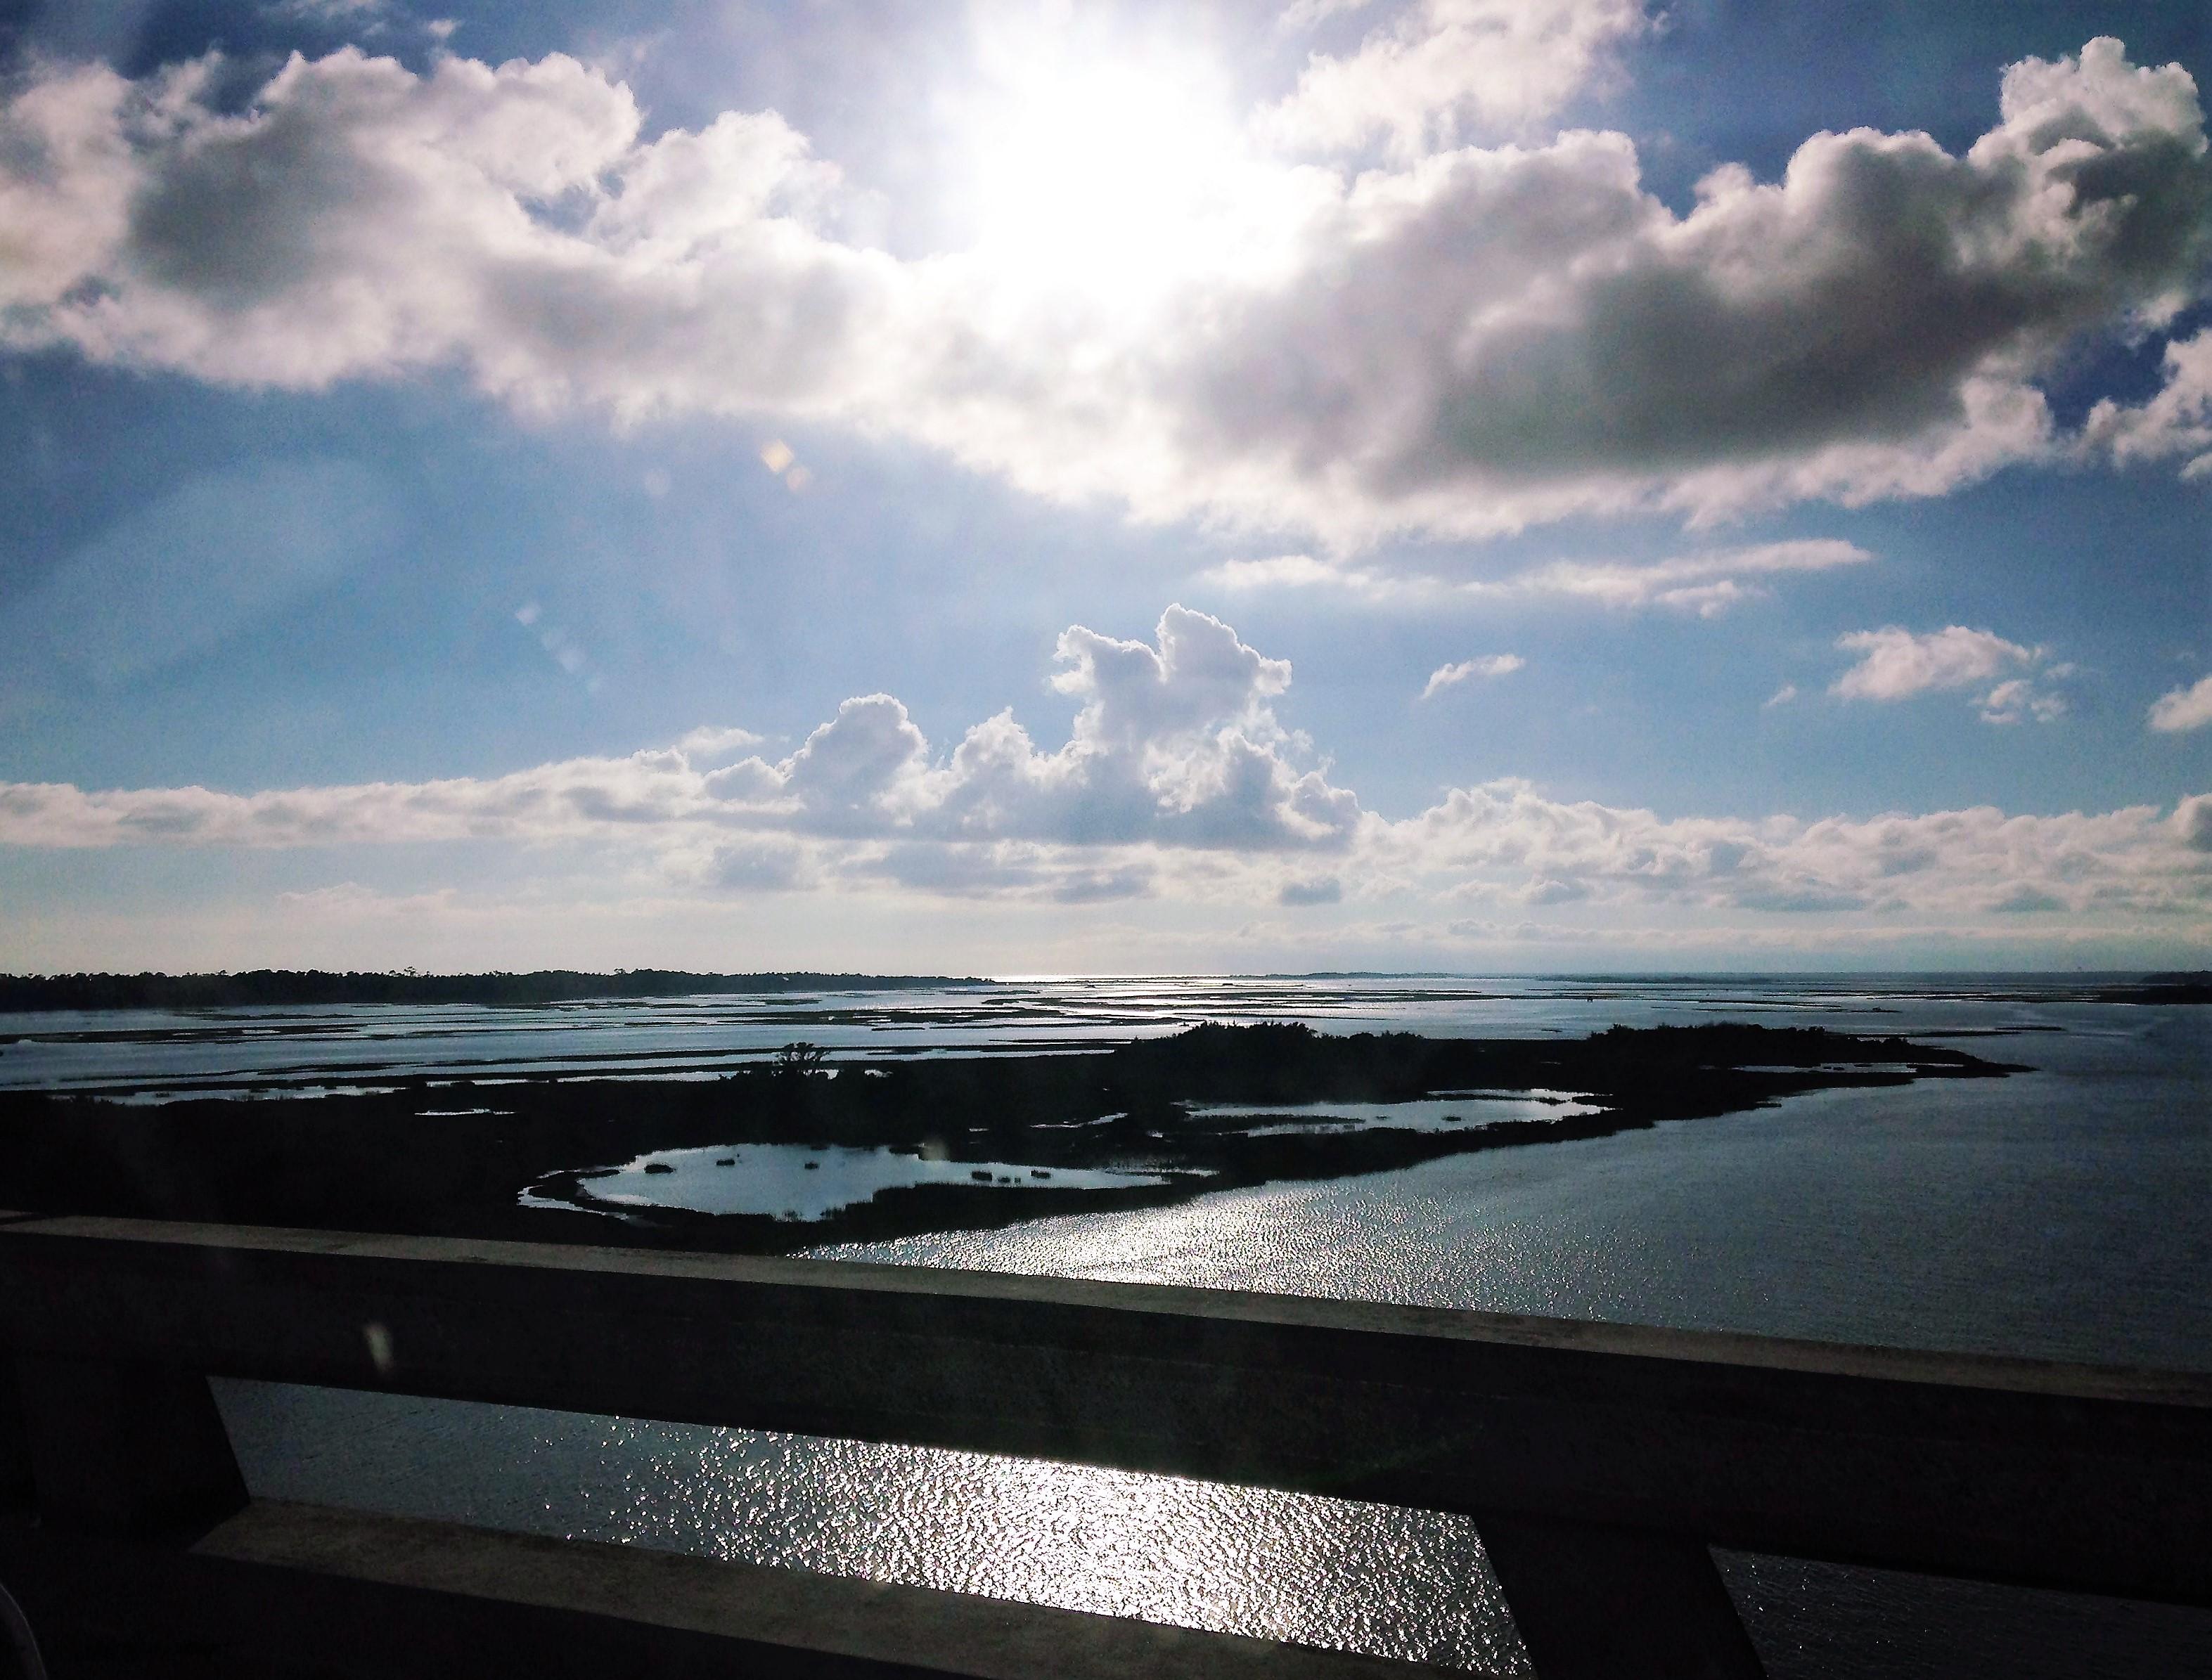 bridgeoverwaterway28229